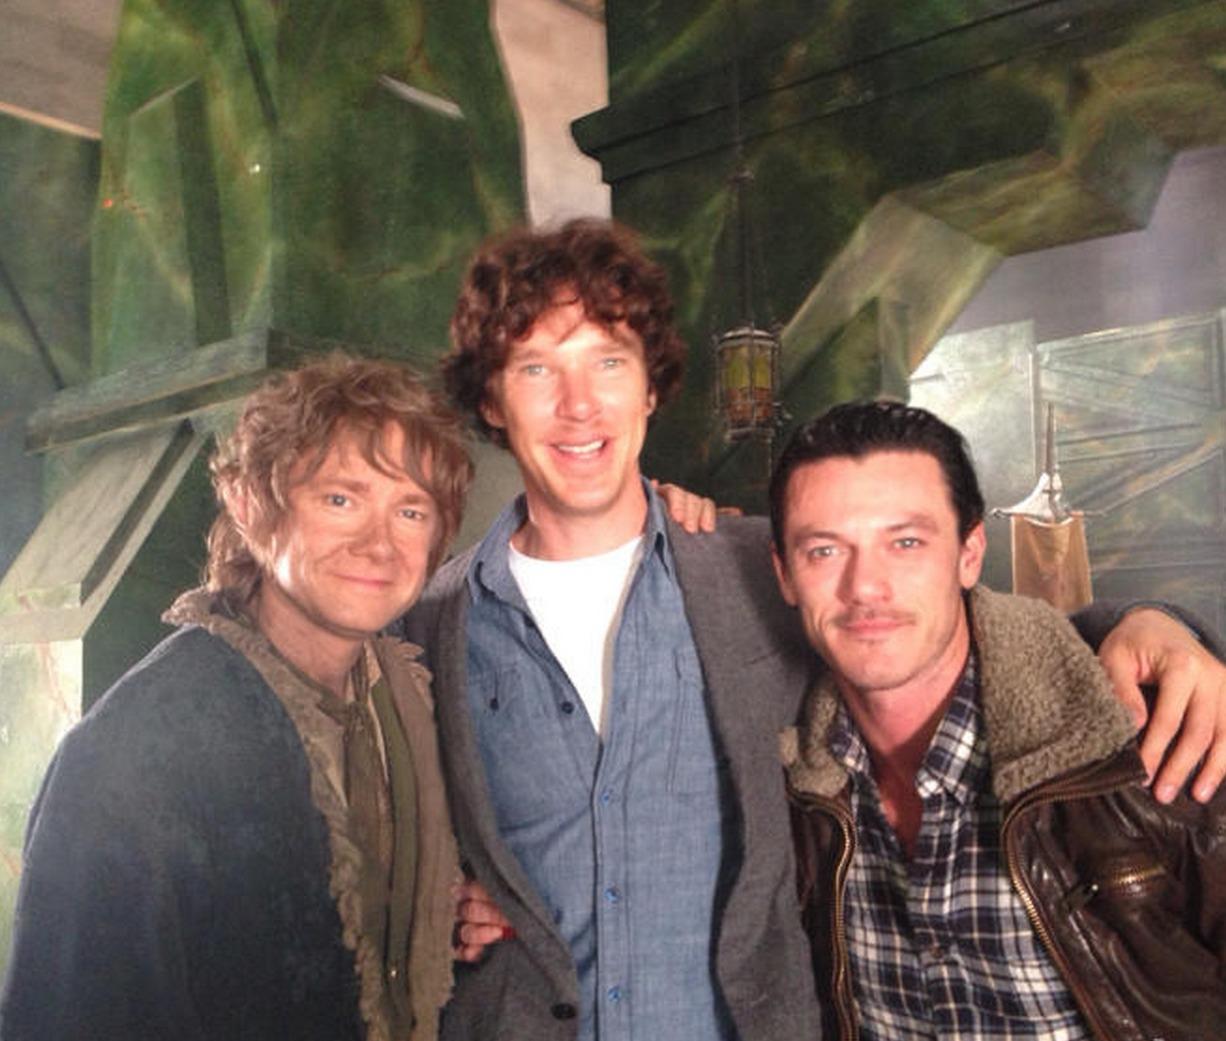 Martin Freeman (Bilbo), Benedict Cumberbatch (Smaug), and Luke Evans (Bard)